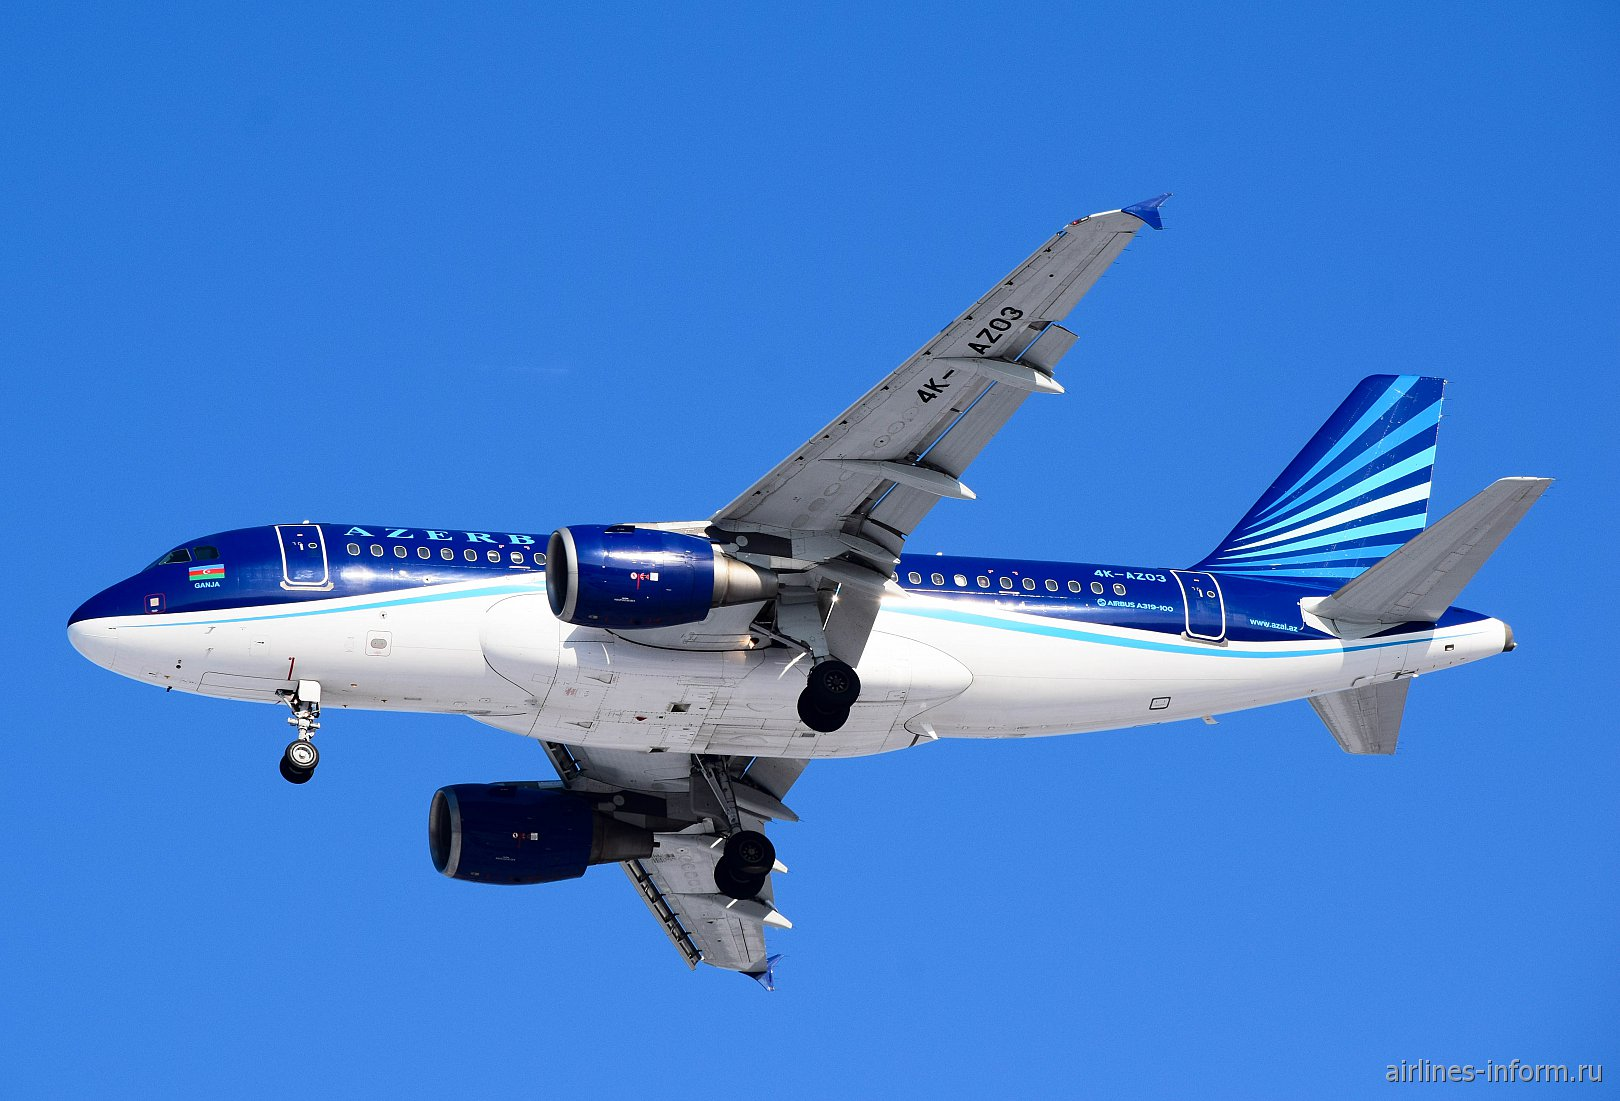 Самолет Airbus A319 4K-AZ03 Азербайджанских авиалиний